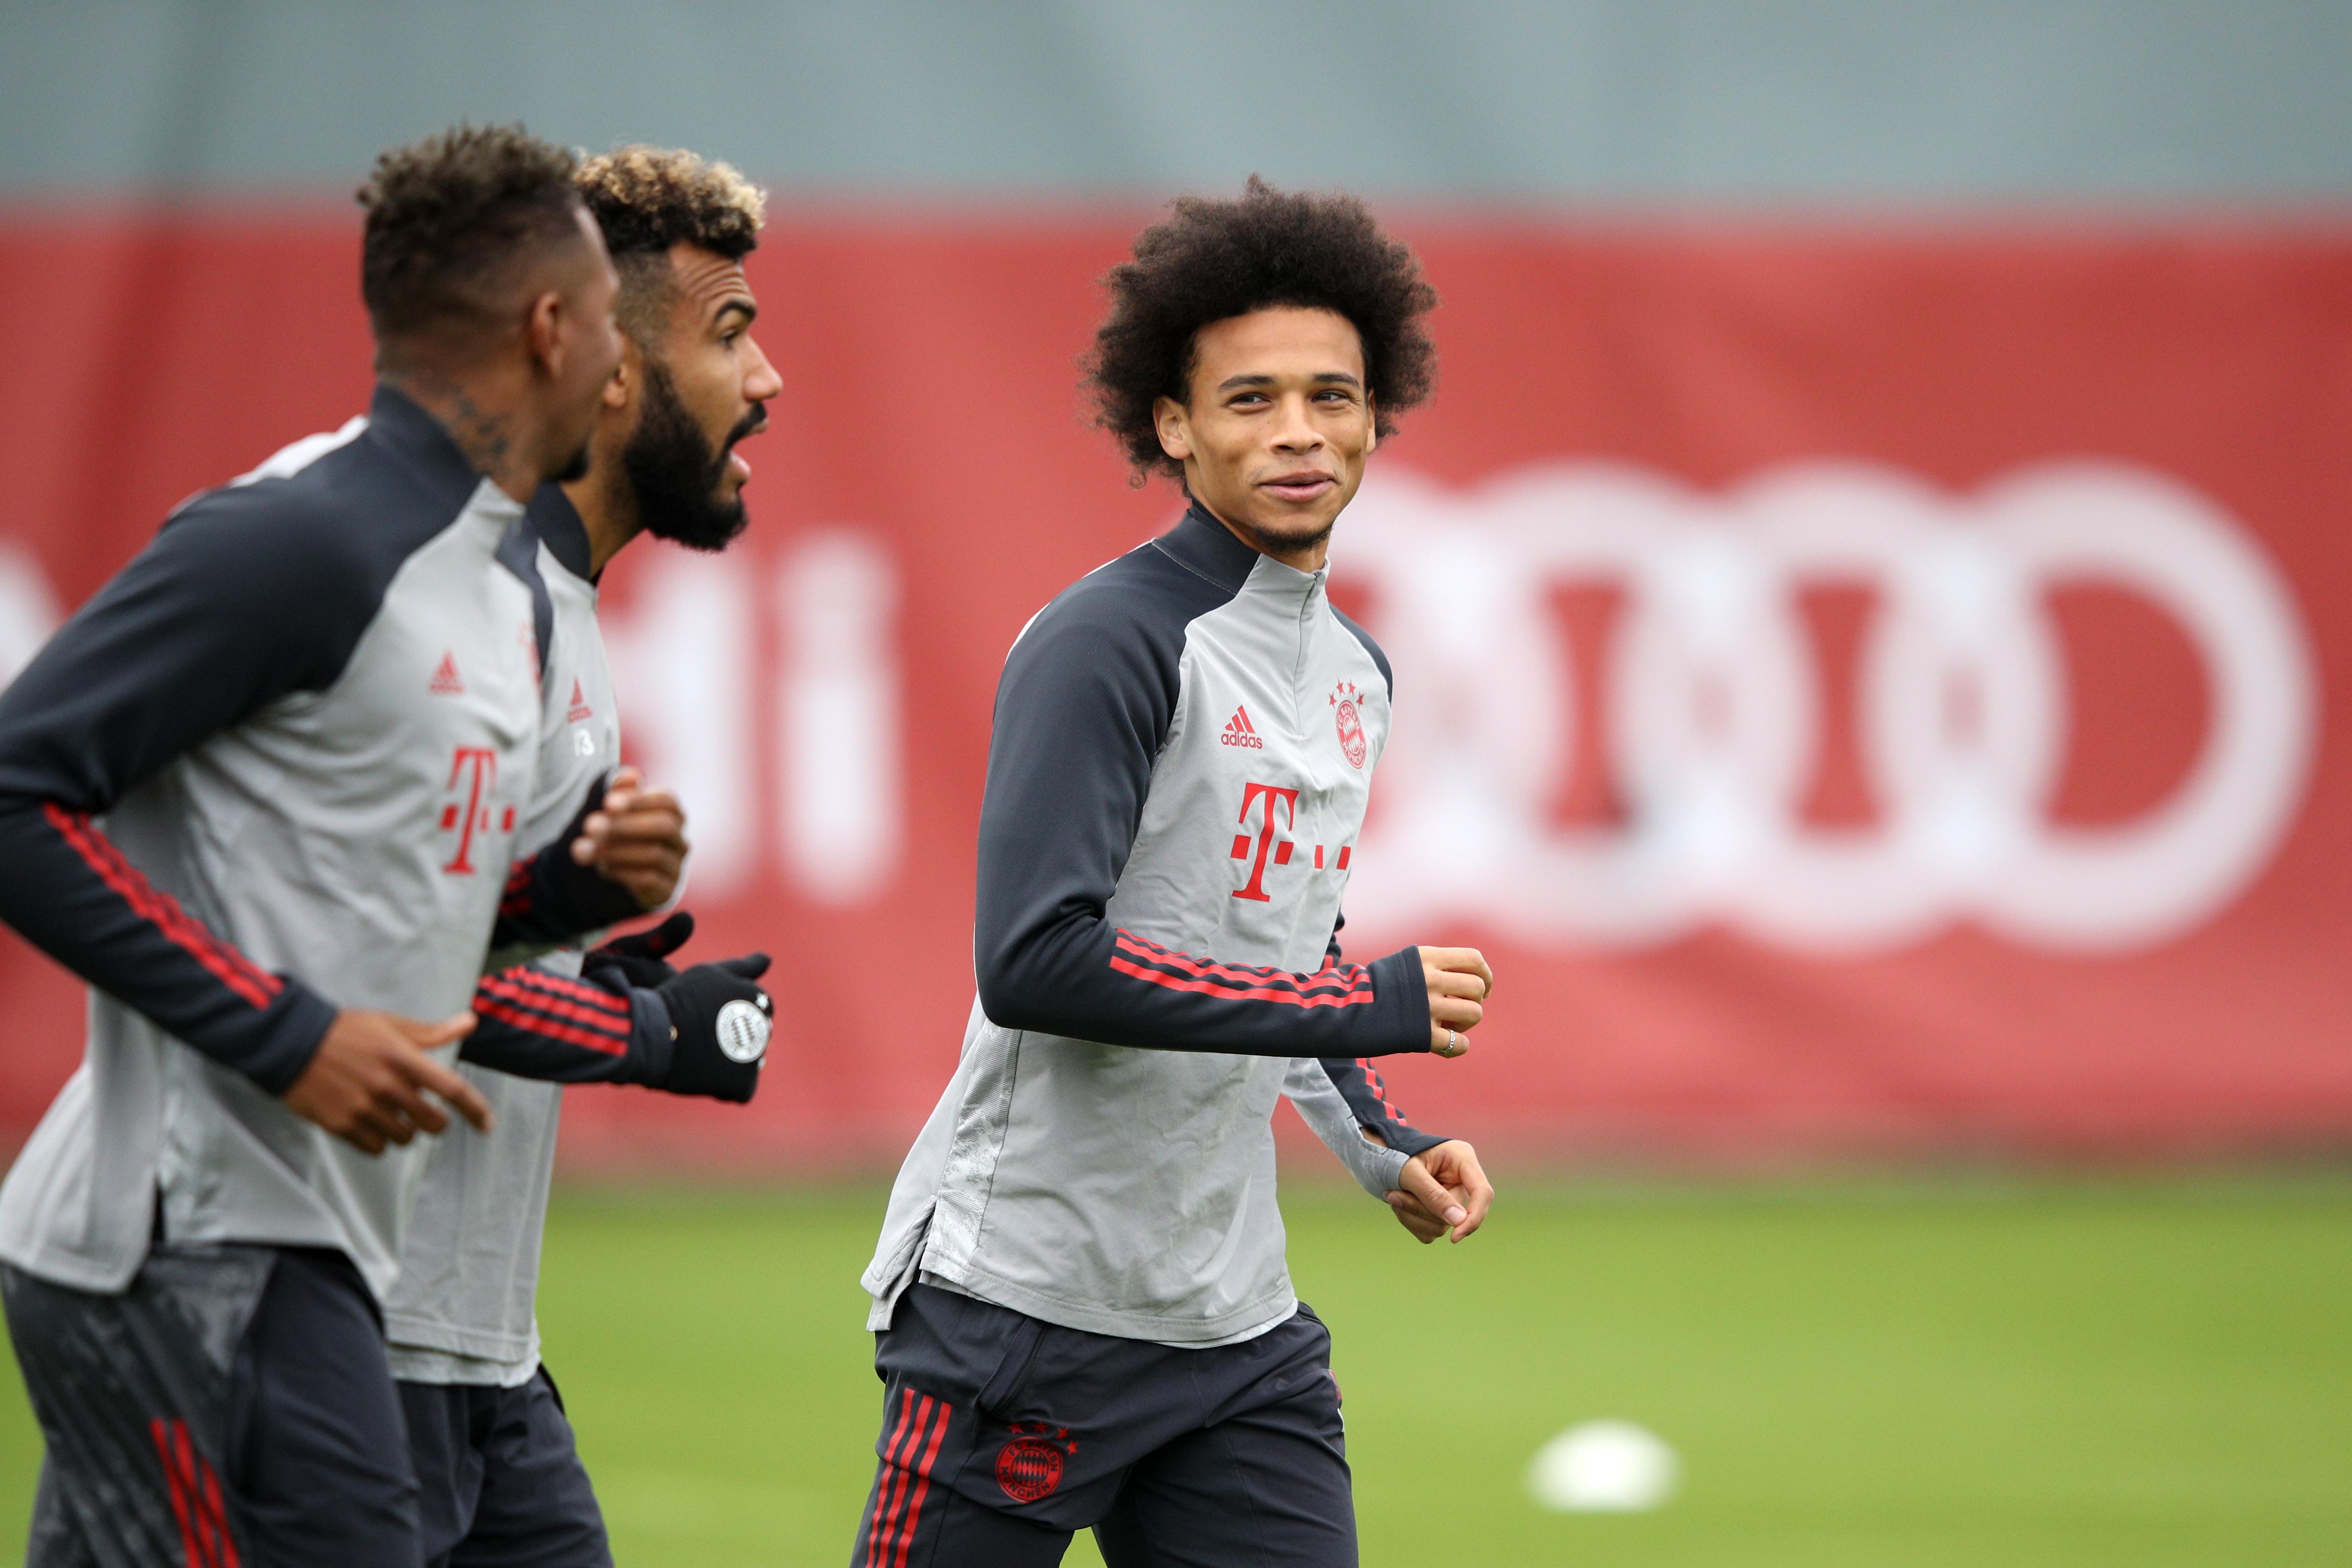 Predicted Bayern Munich Vs Atletico Madrid - Sane set to start.